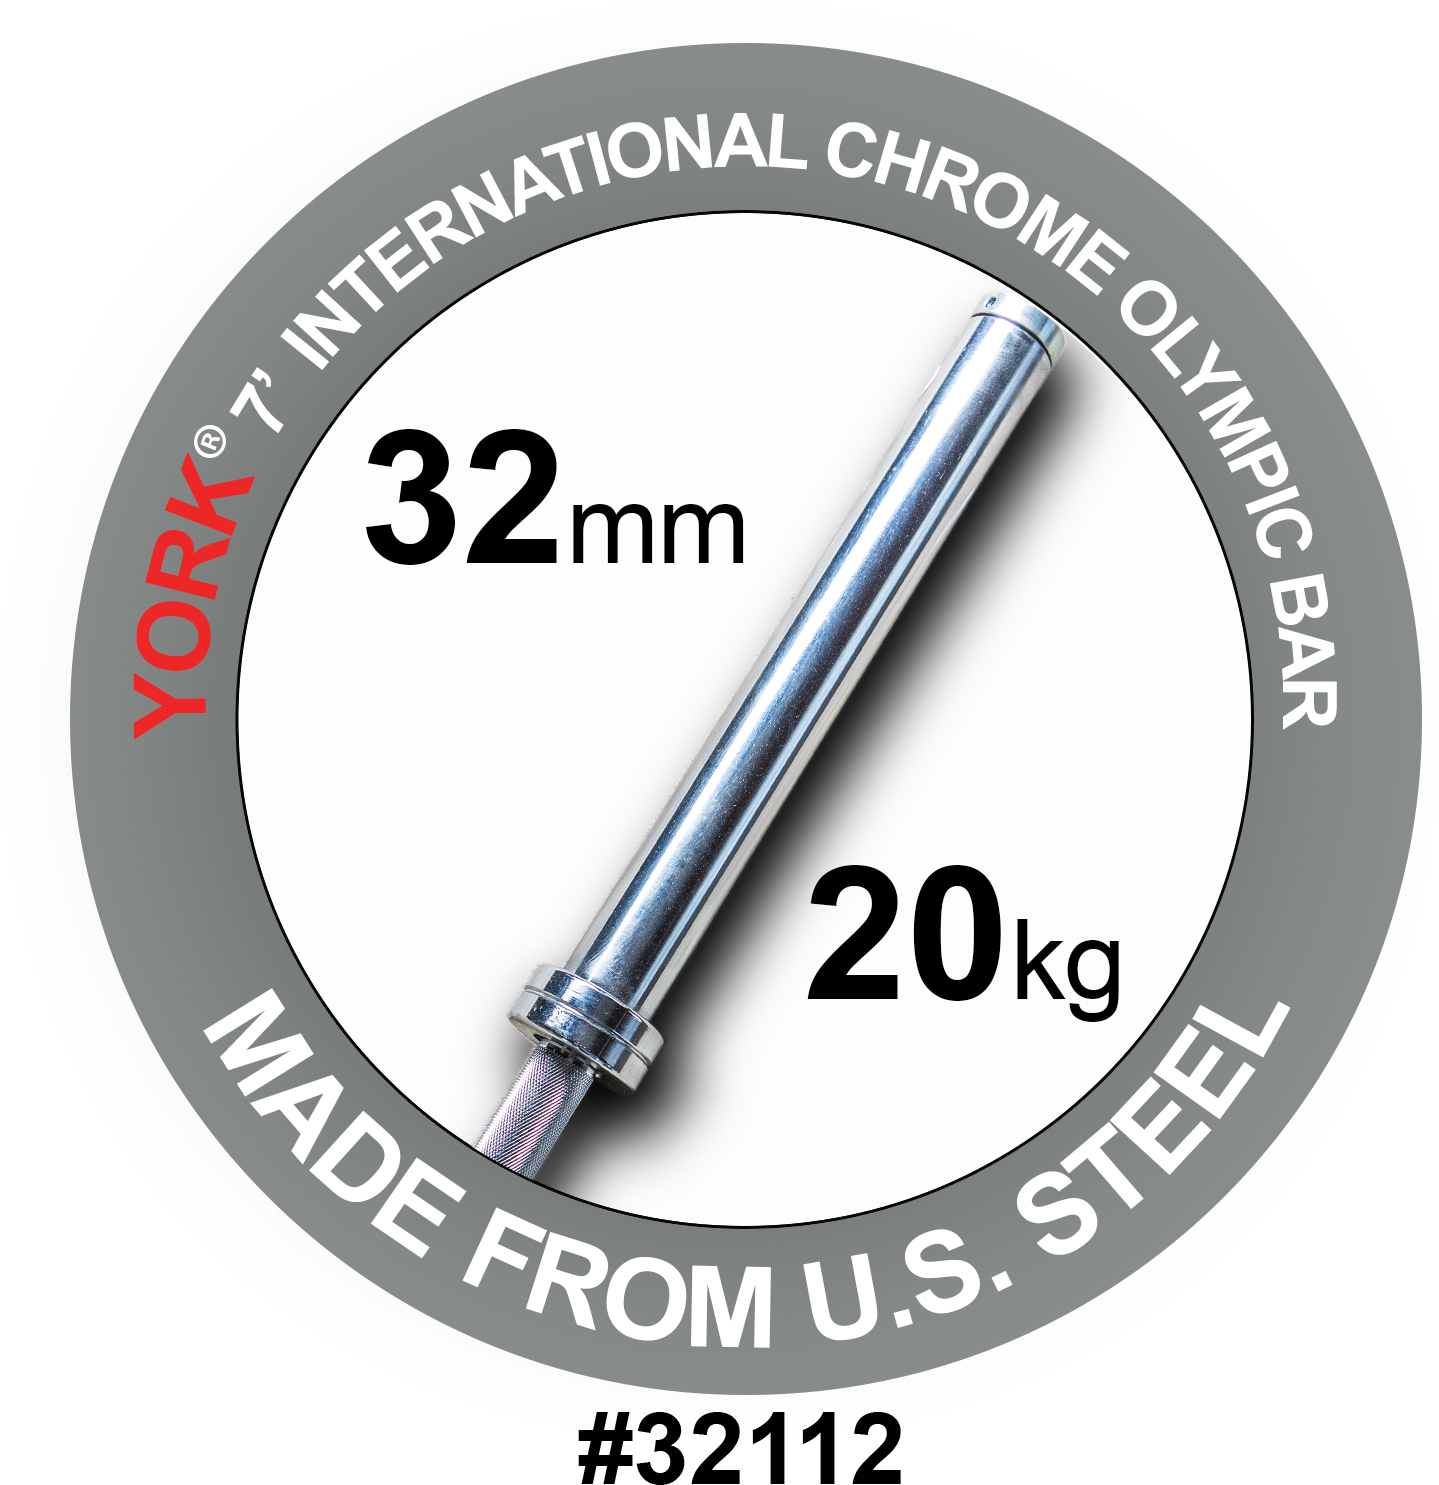 YORK 7′ International Chrome Olympic Bar – 32mm